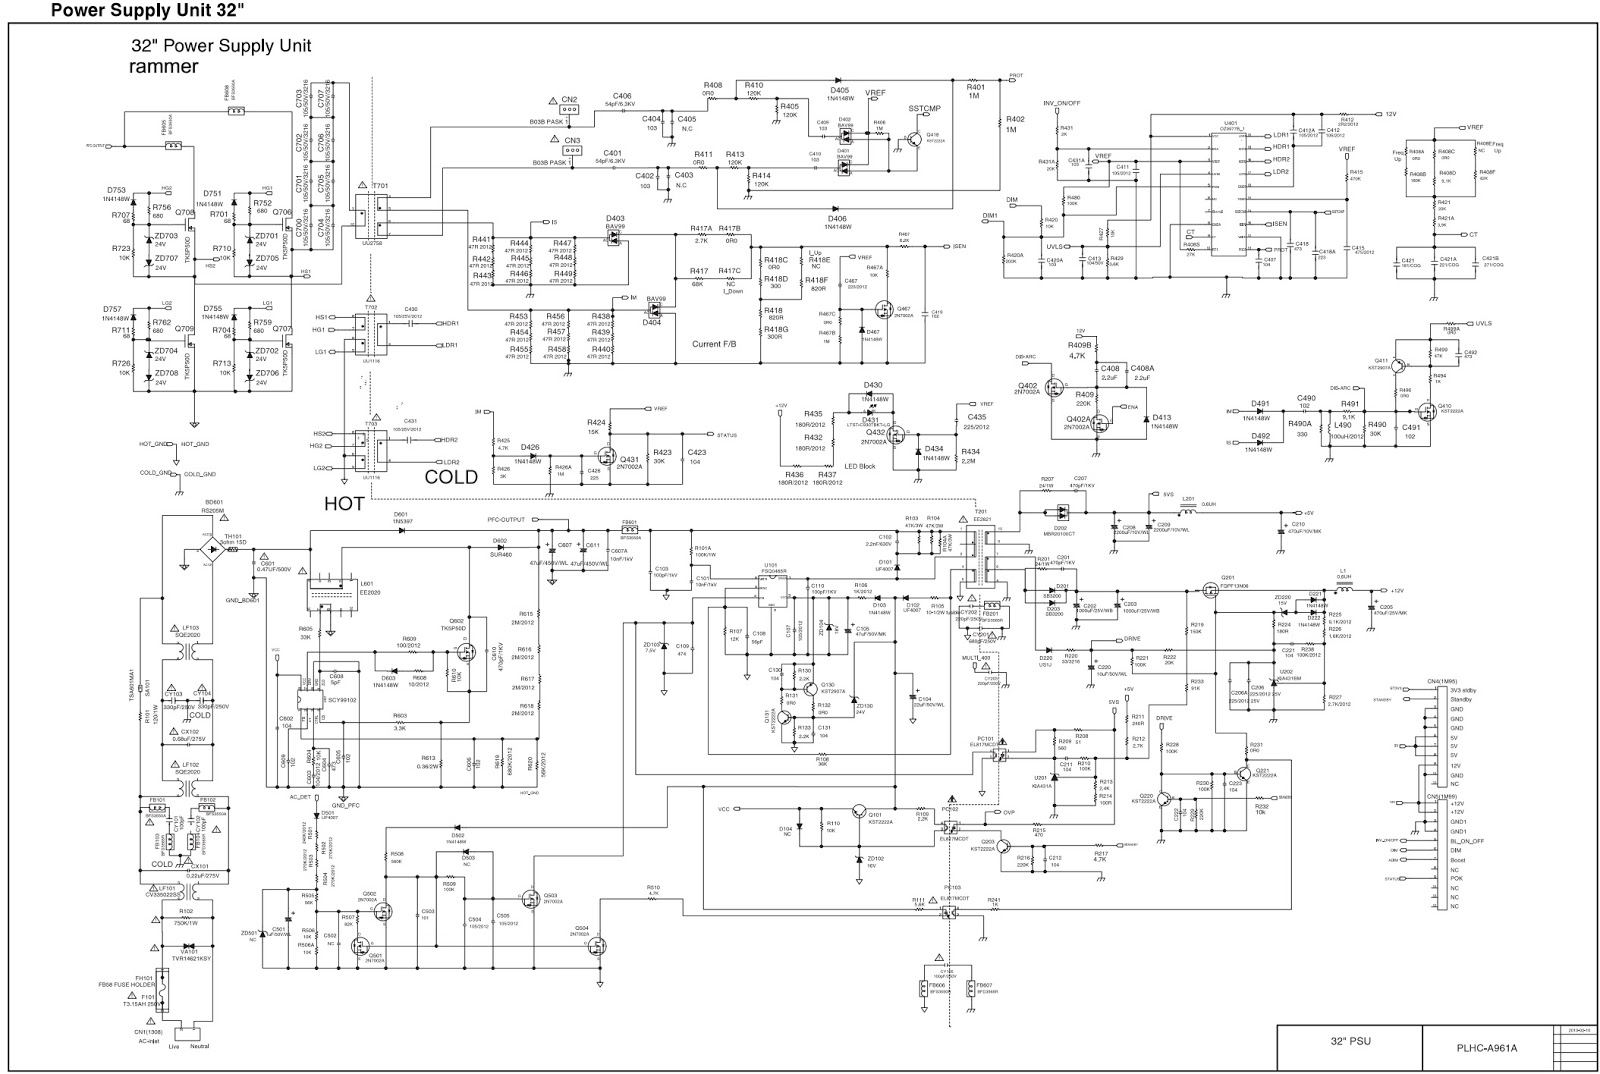 Philips 32 inch LCD TV power supply Circuit Diagram – RAM1